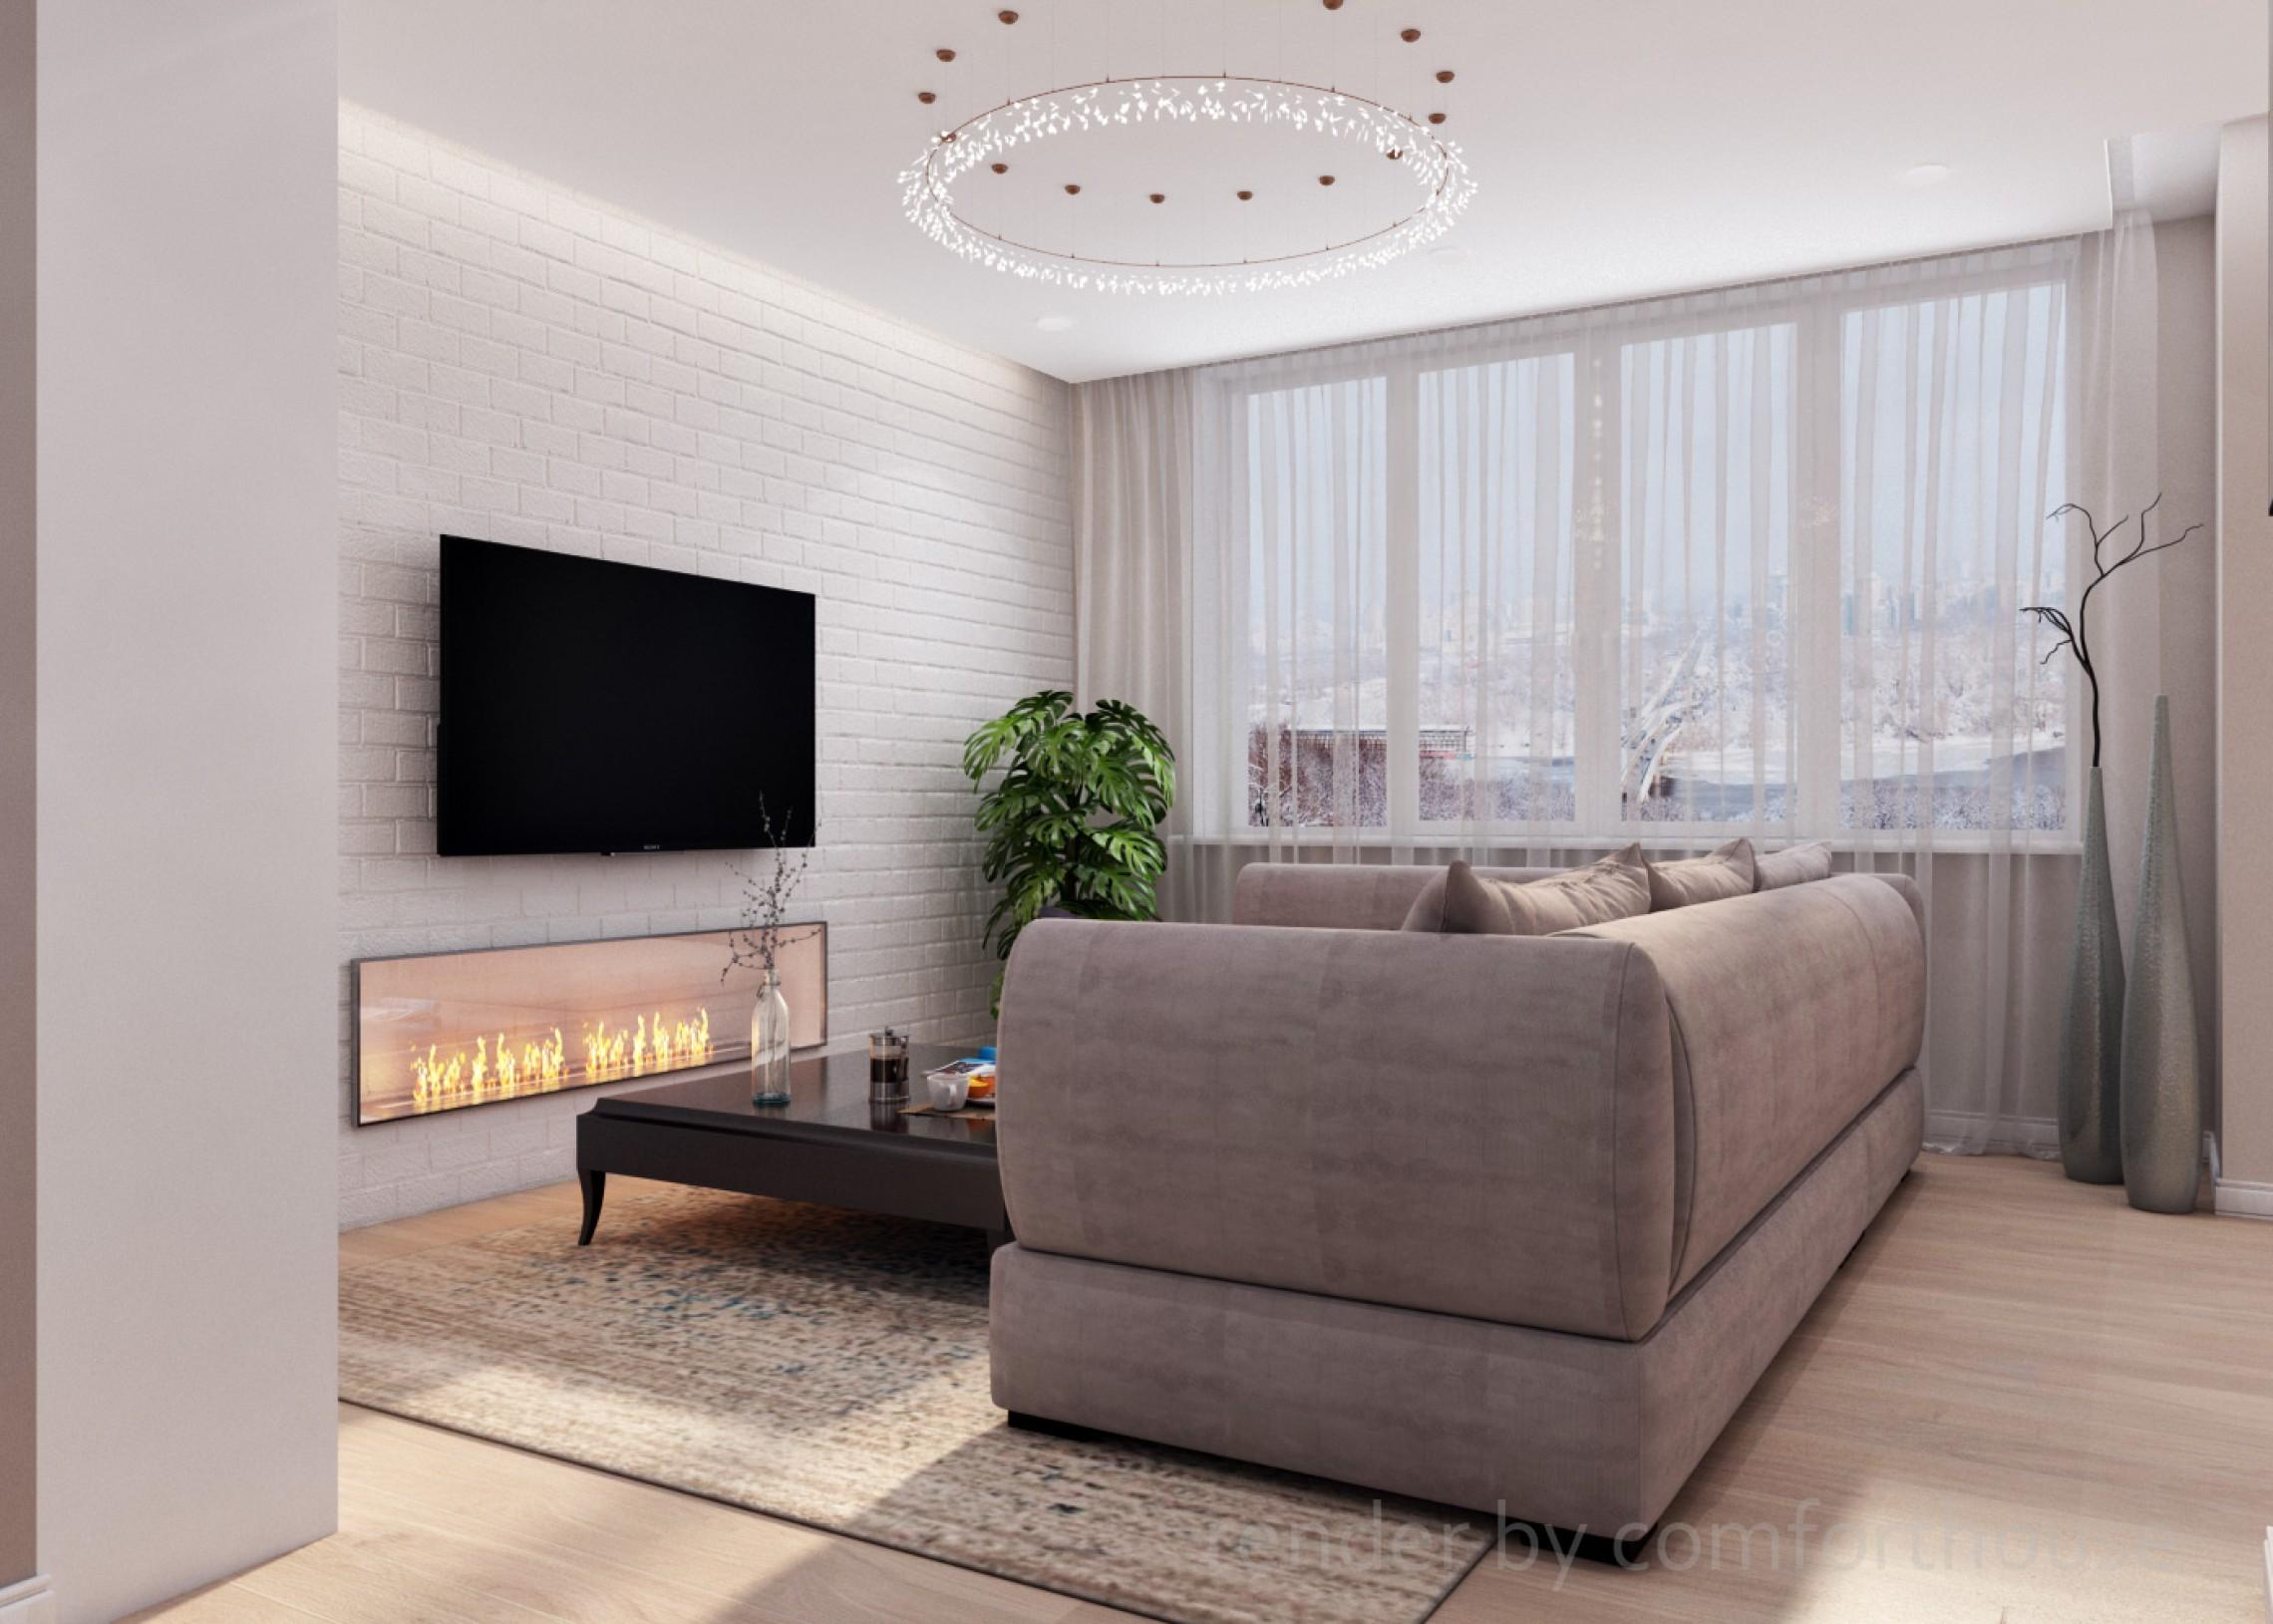 Modern light interior